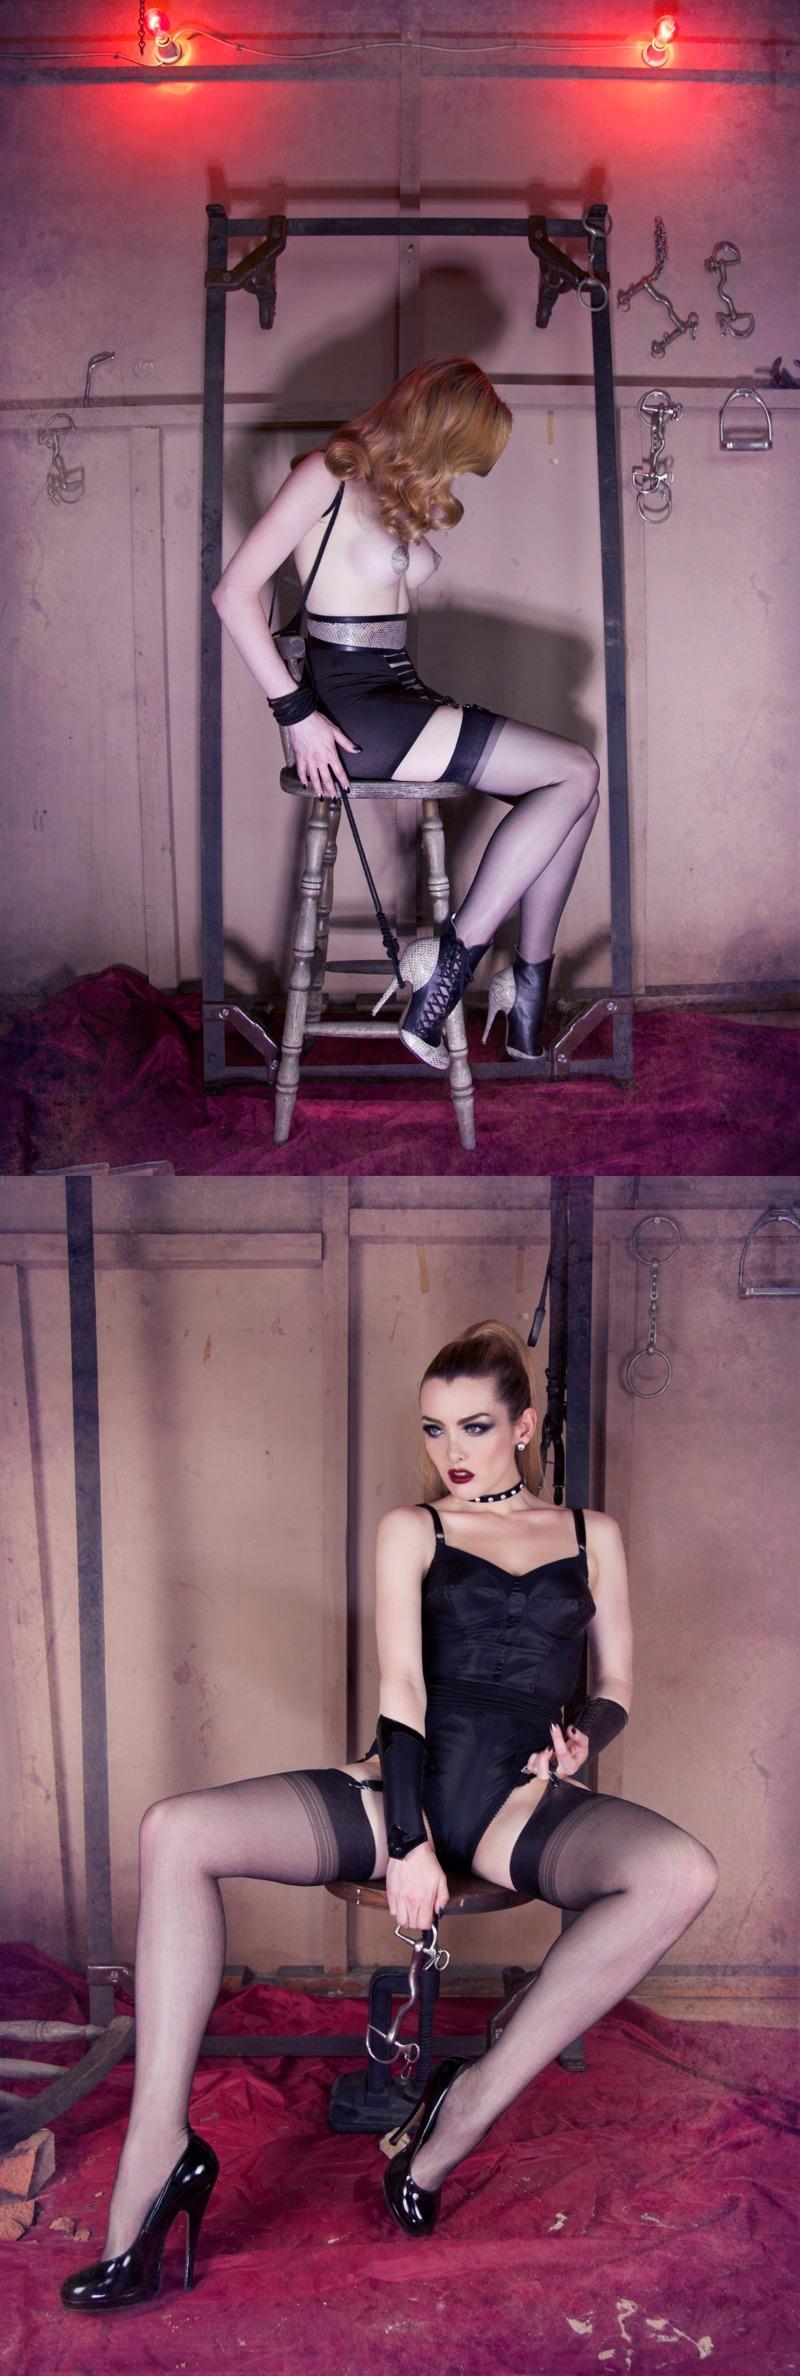 Dec 10, 2012 Miss Miranda for Fabulously Fetish